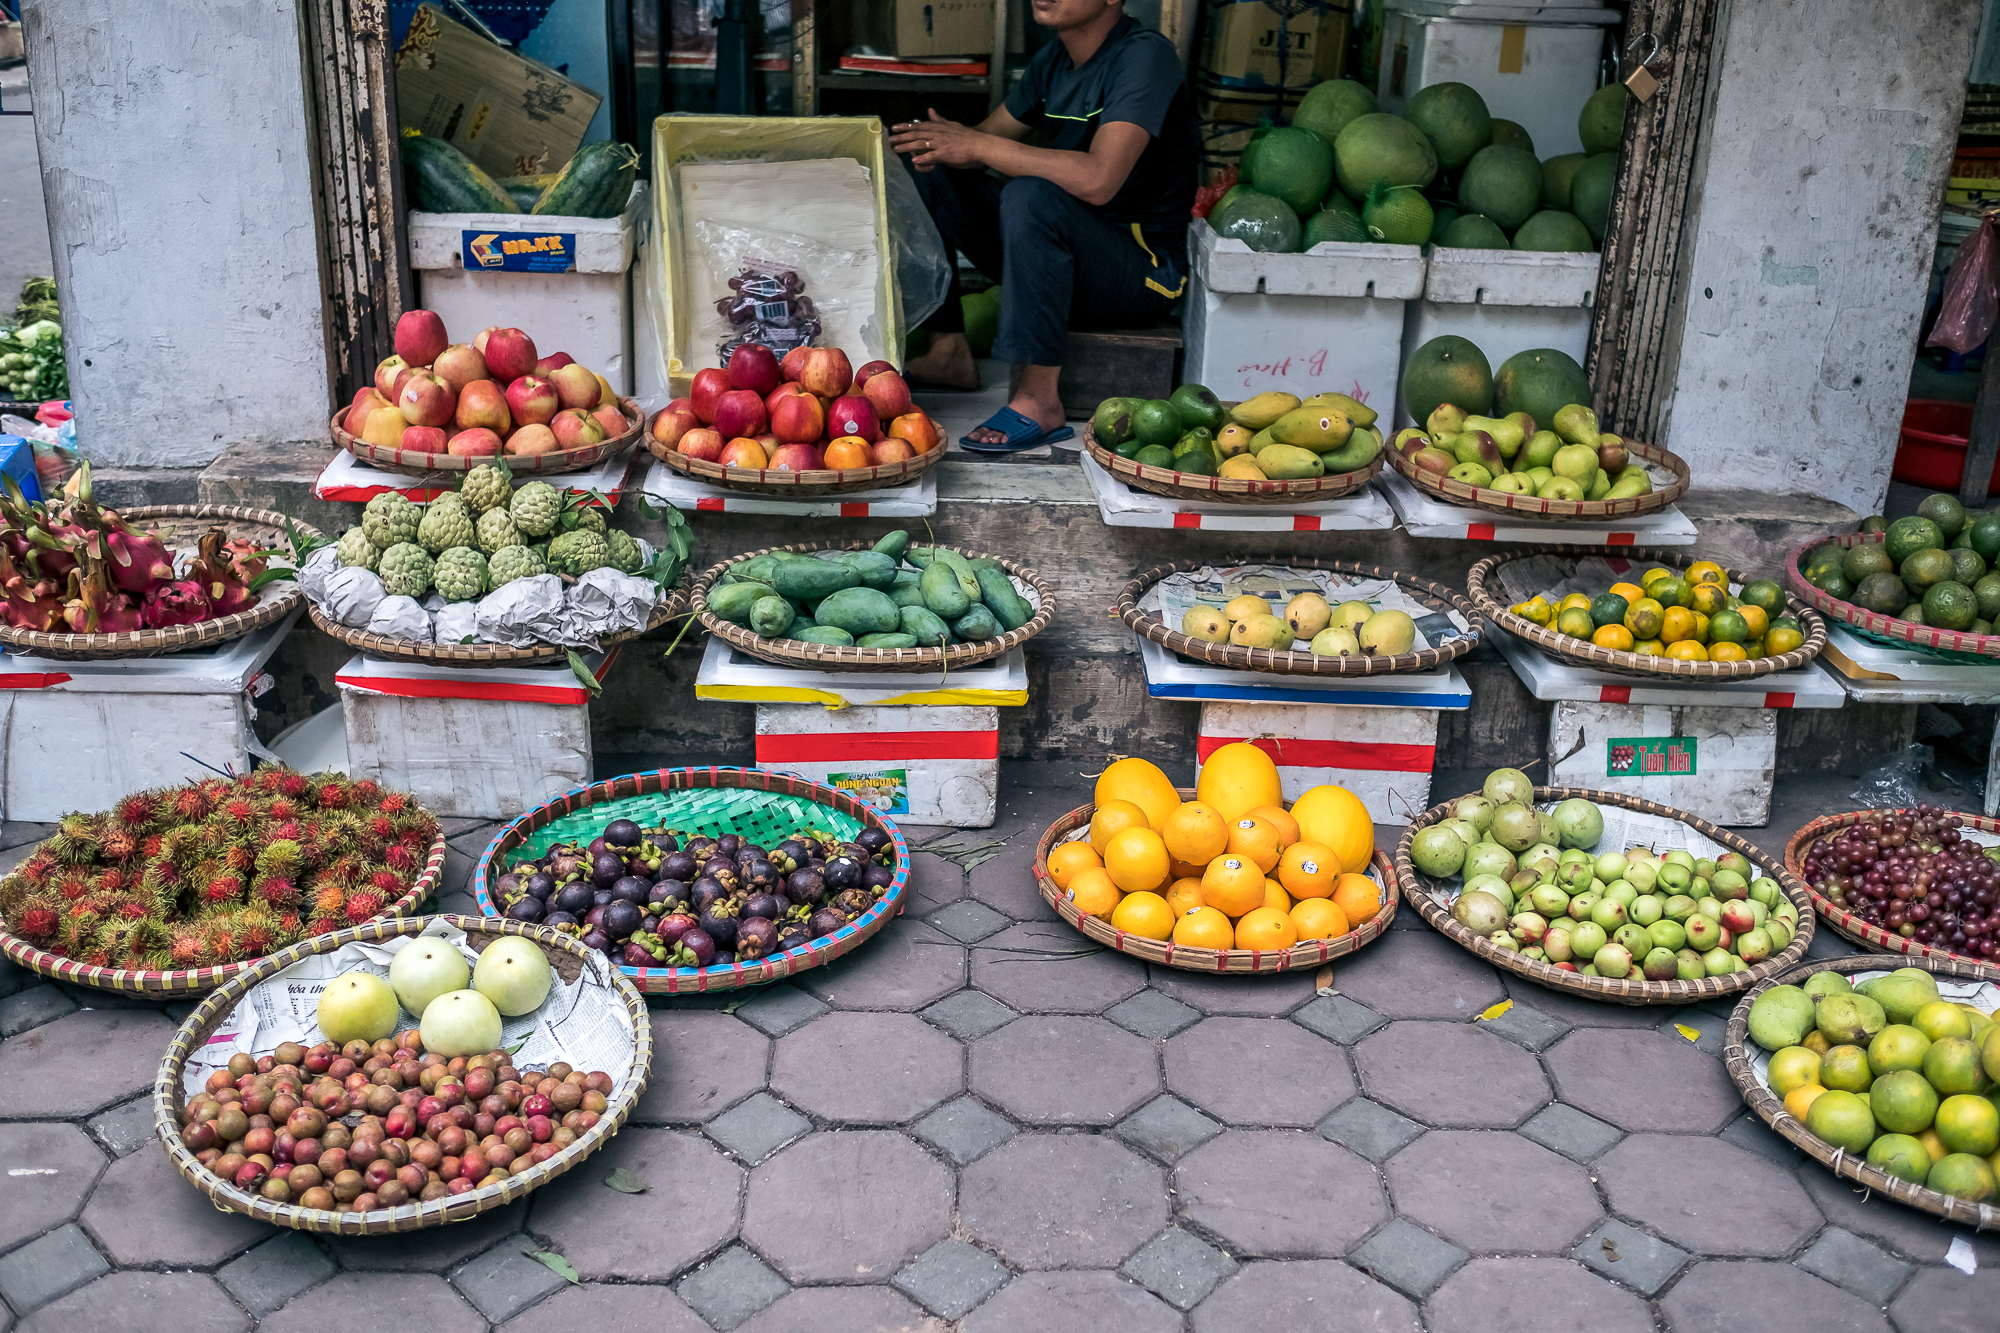 Vietnam_Honeymoon_TheOutsiderBlog_DSCF7971.JPG